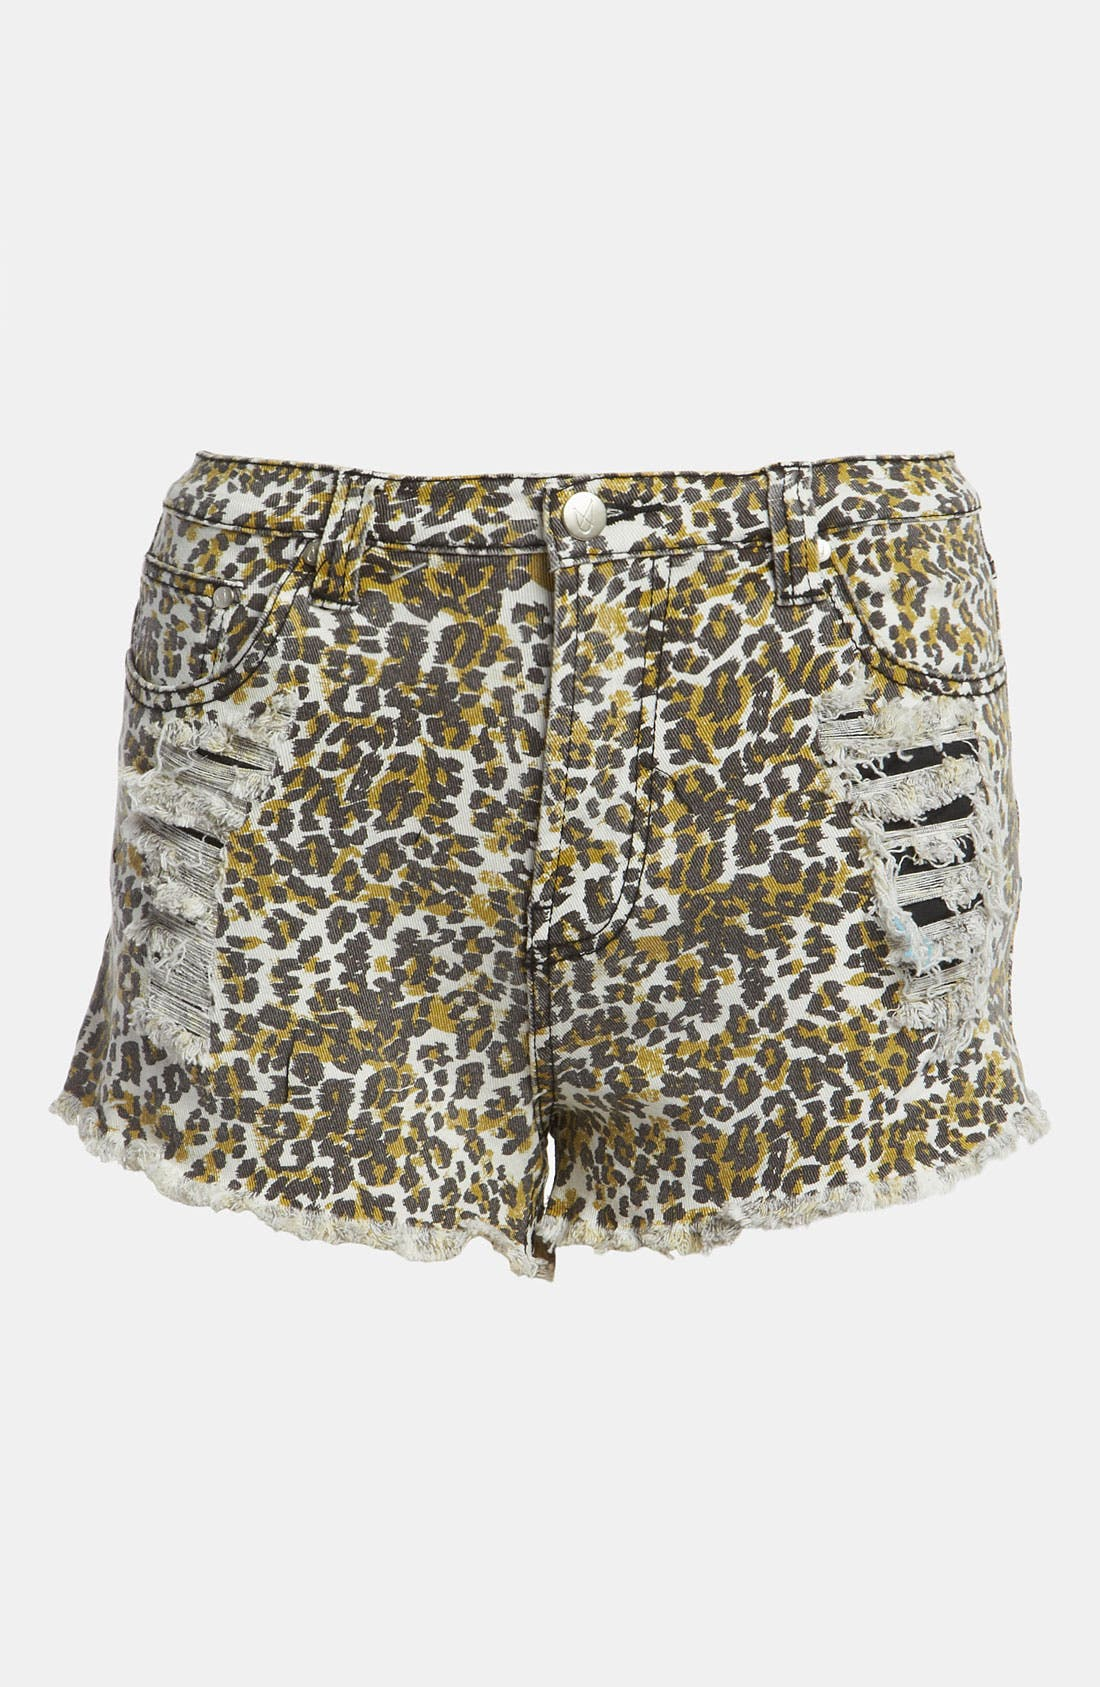 Main Image - MINKPINK 'Runaway Leopard' Slash Shorts